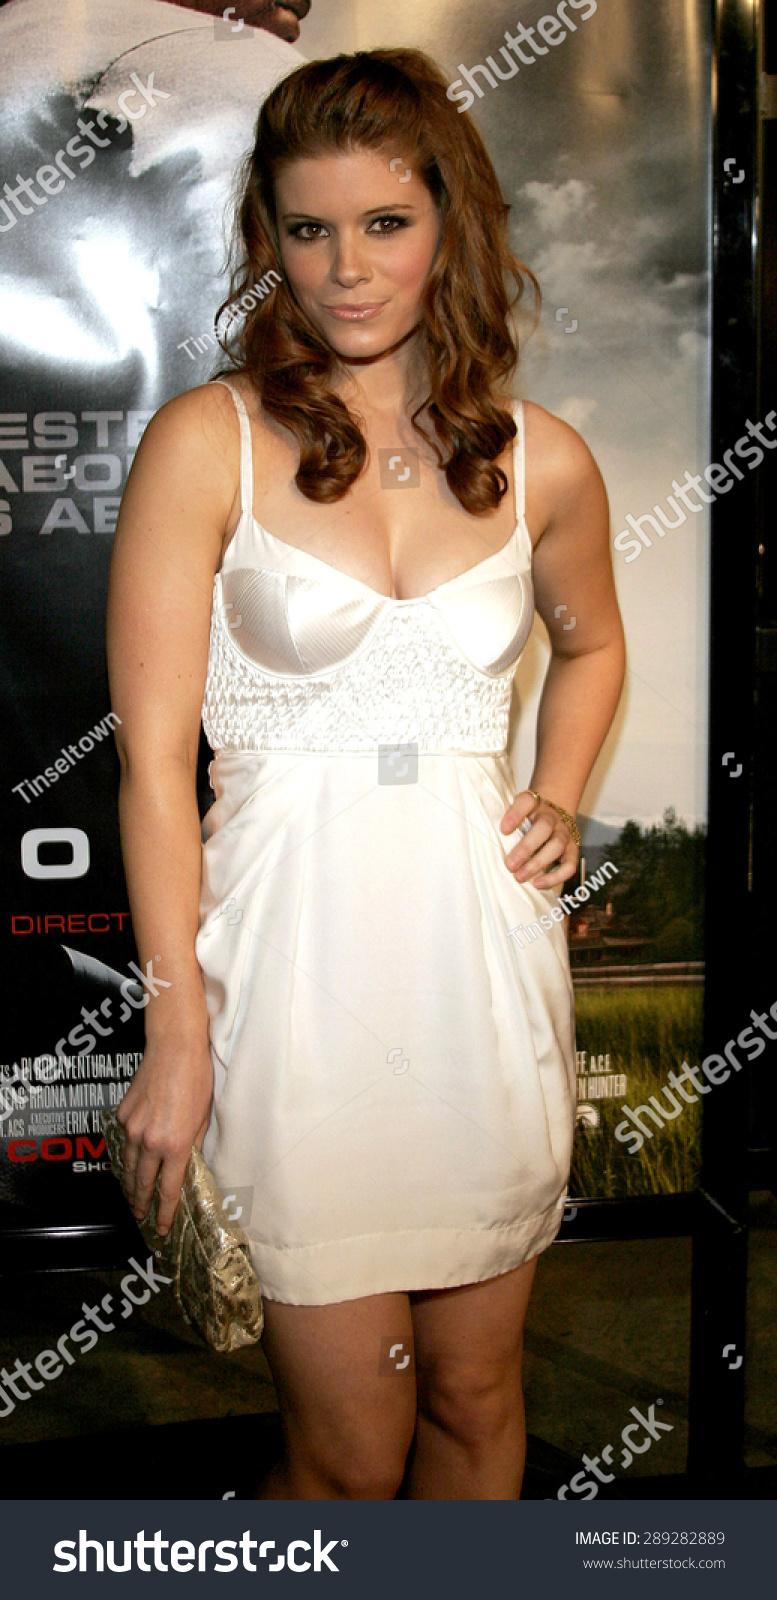 Adriana Deville Nude Photos 54